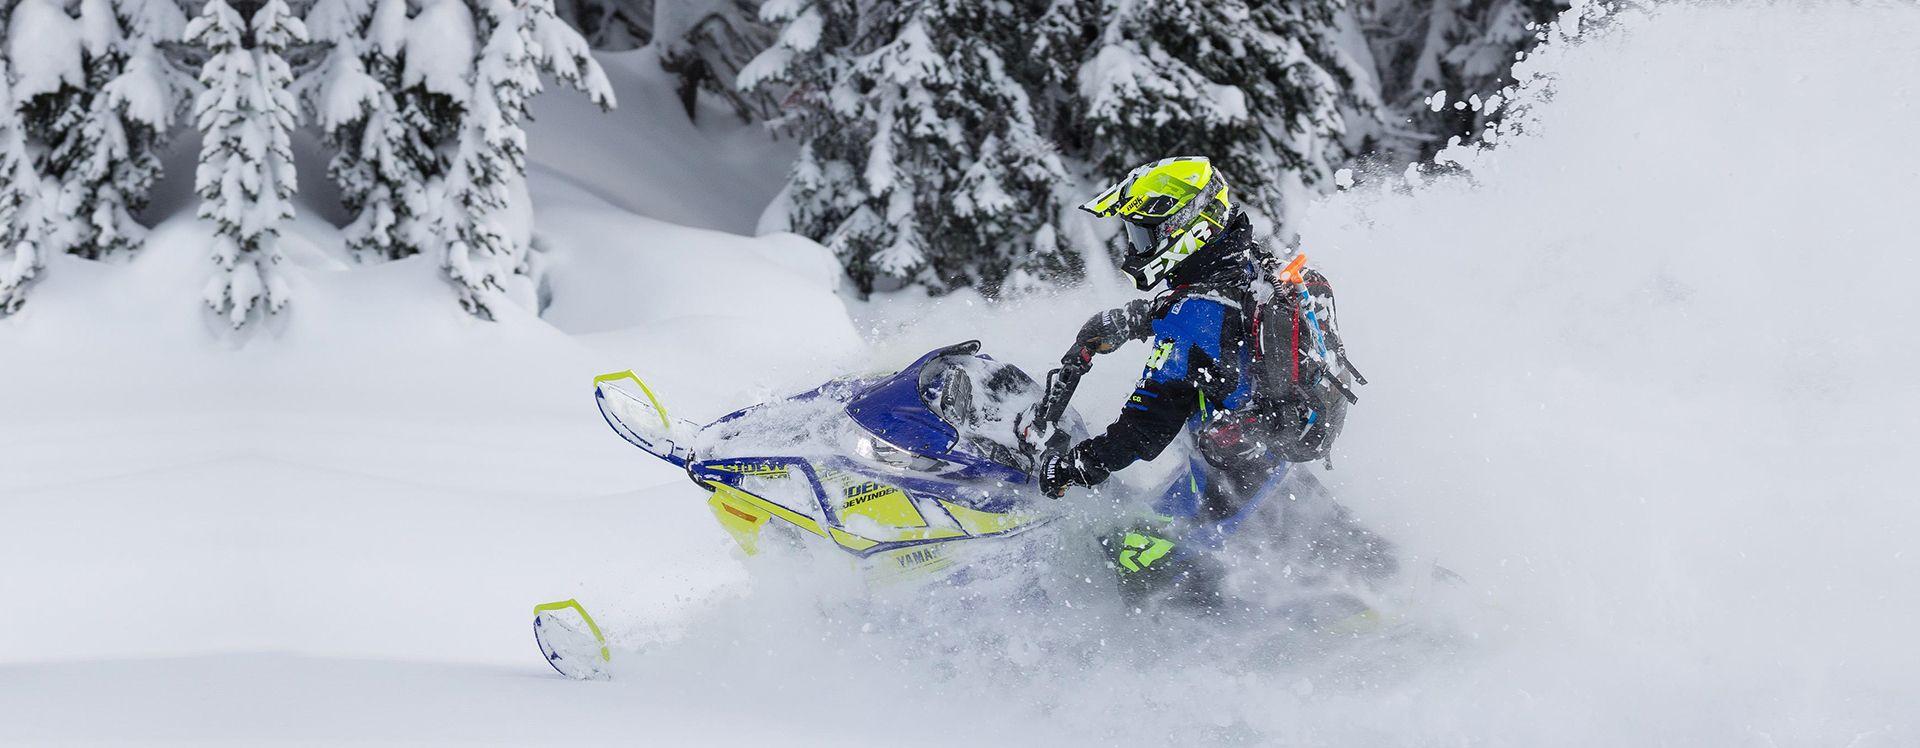 Motoneige Yamaha Snowmobile, Landmarks, Natural landmarks